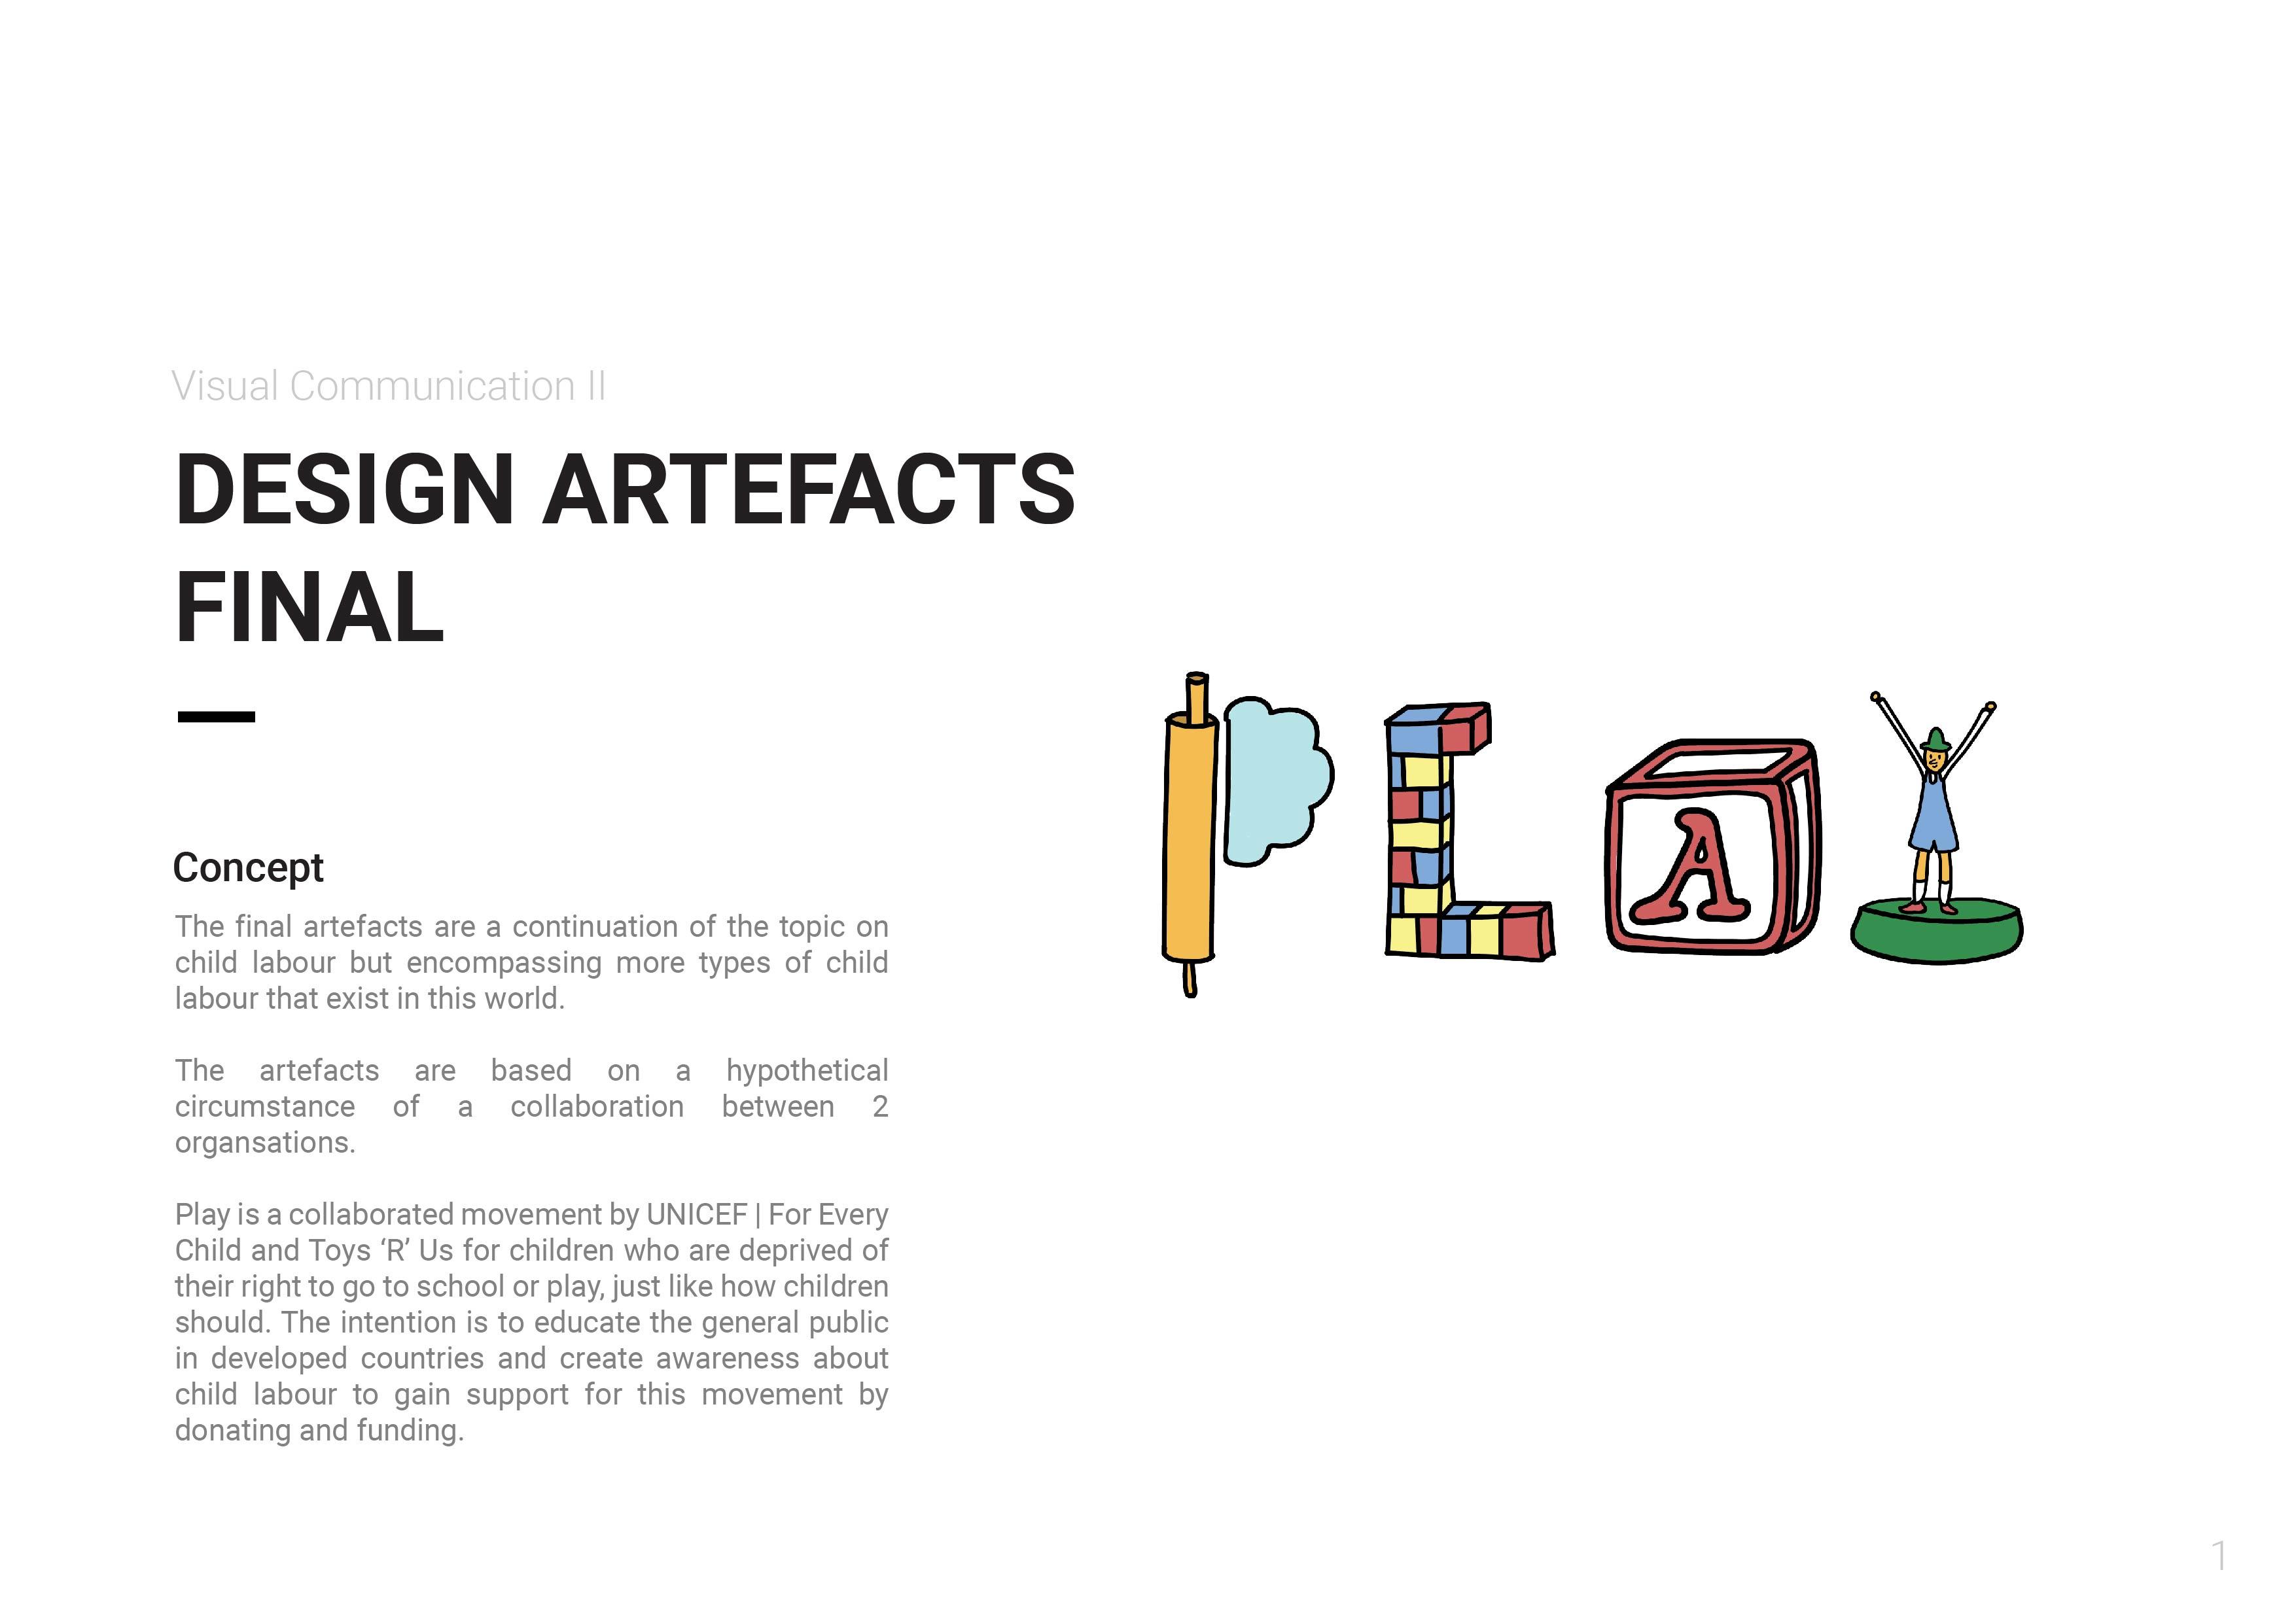 Design Artefacts design artefact 1 final | danielle koh